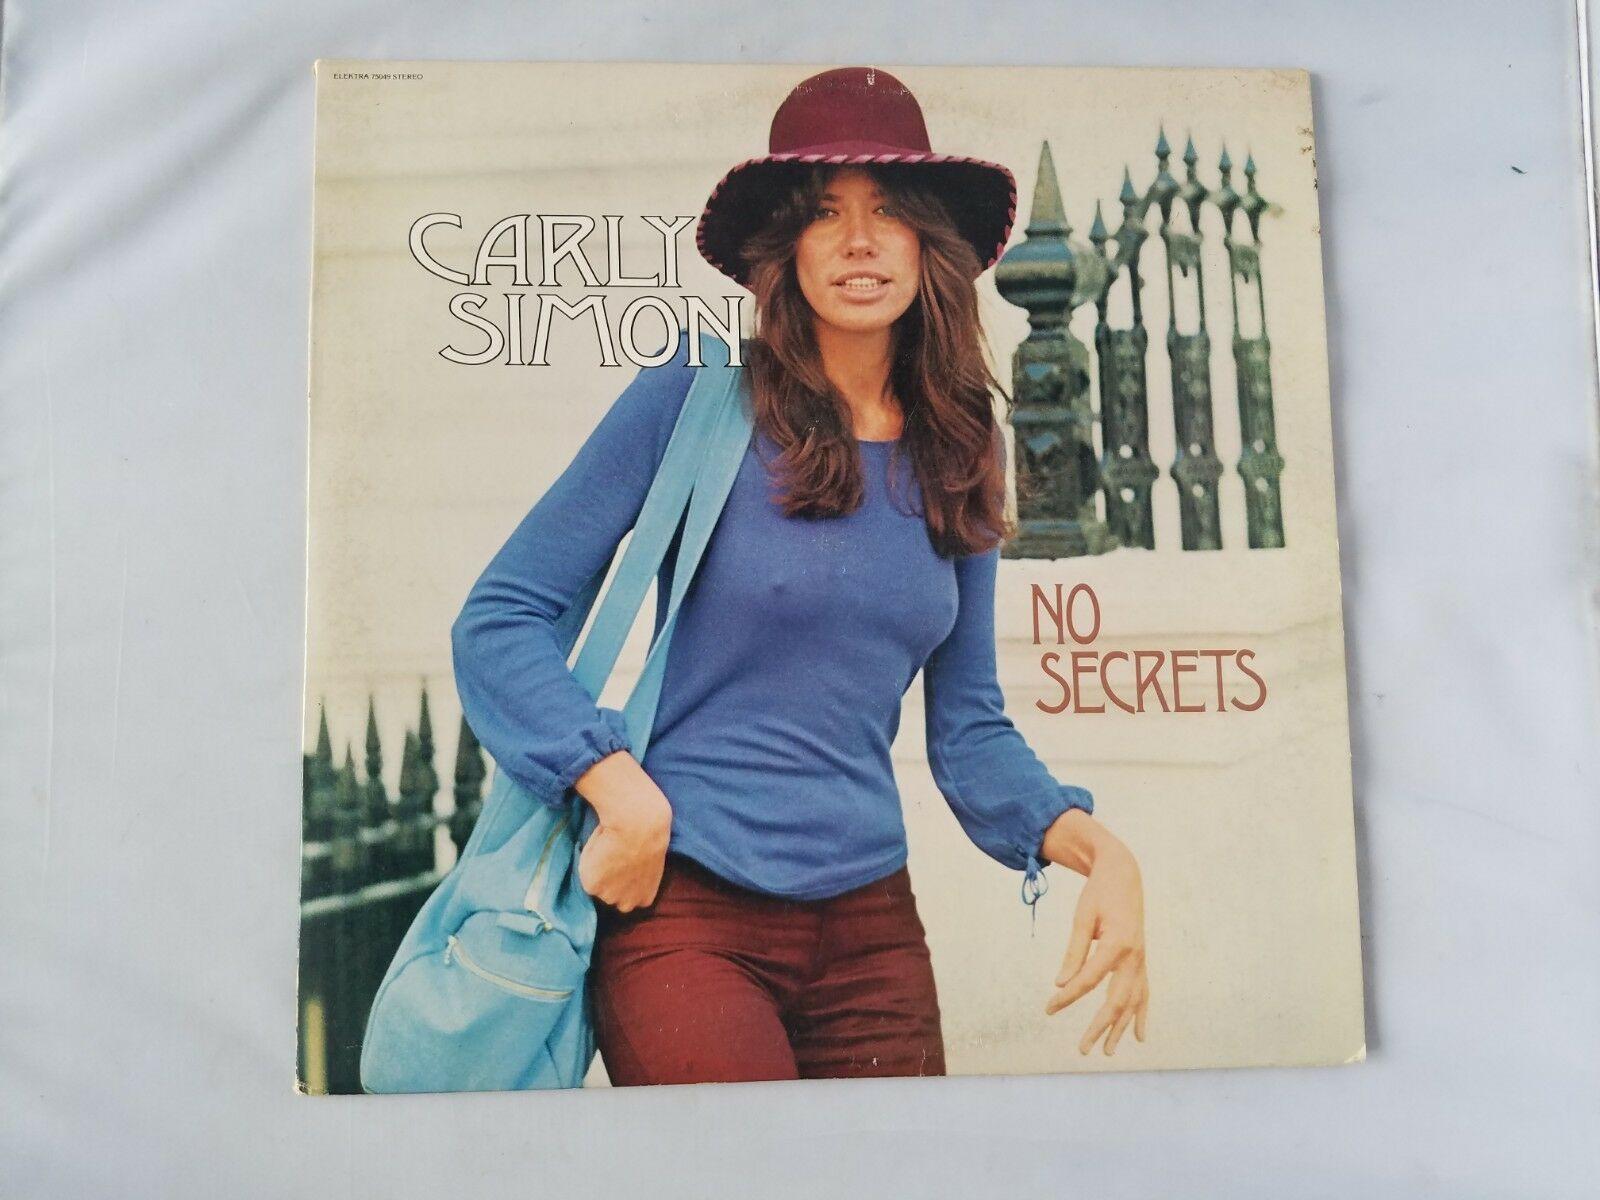 Carly Simon No Secrets Vinyl Record Vintage 1972 Elektra EKS 75049 Stereo